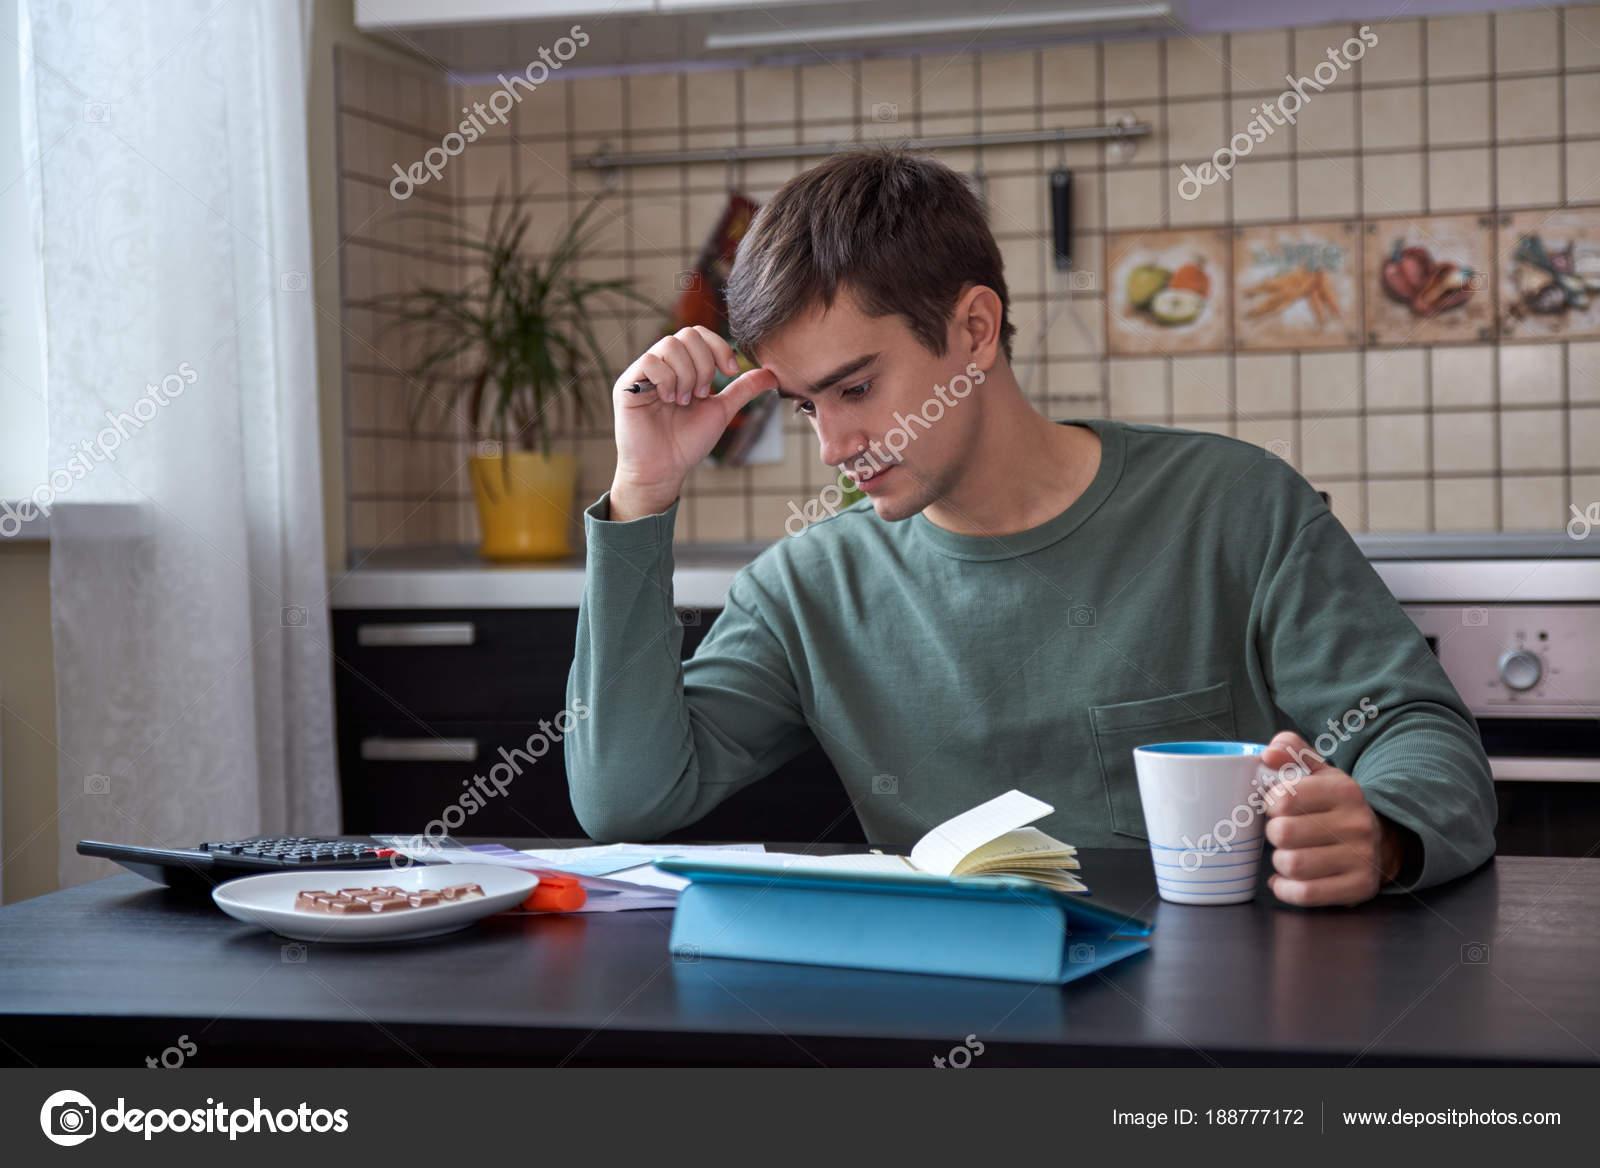 kitchen calculator cabinet on wheels 一个有深思熟虑的焦虑表情的年轻人坐在厨房的桌子上 用计算器和笔记本 用计算器和笔记本来计算家庭预算和当前支出 照片作者sky dog